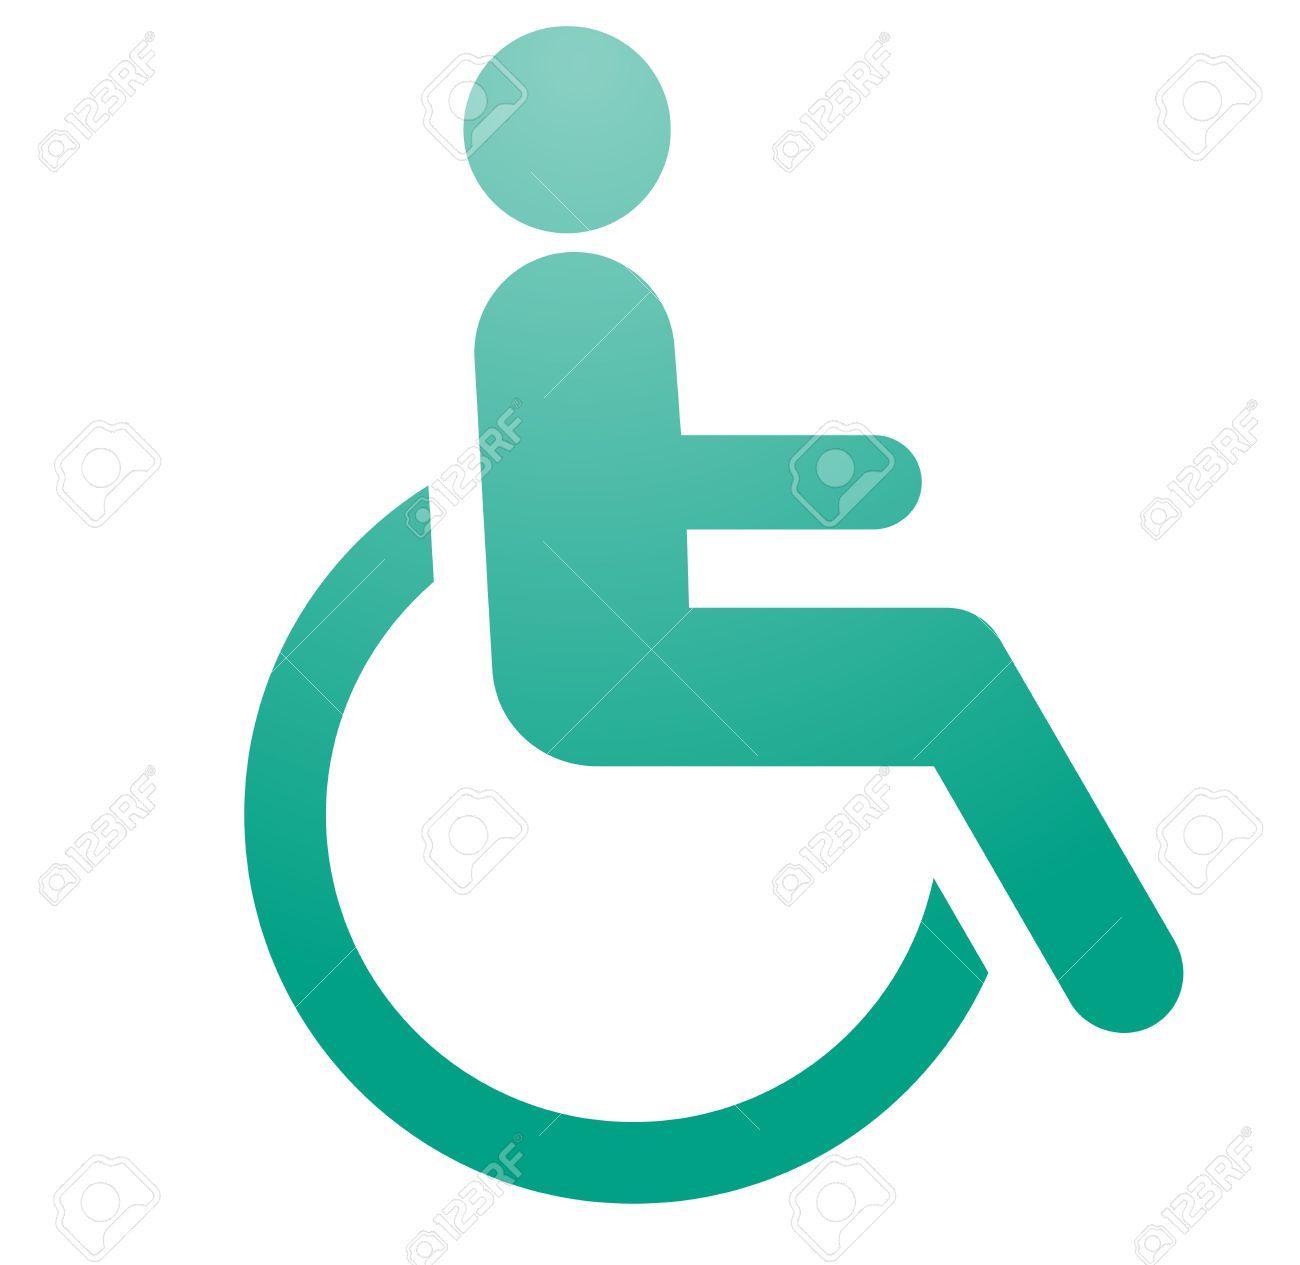 handicap symbol illustration icon of wheelchair clipart stock photo rh 123rf com wheelchair clip art funny wheelchair clip art funny